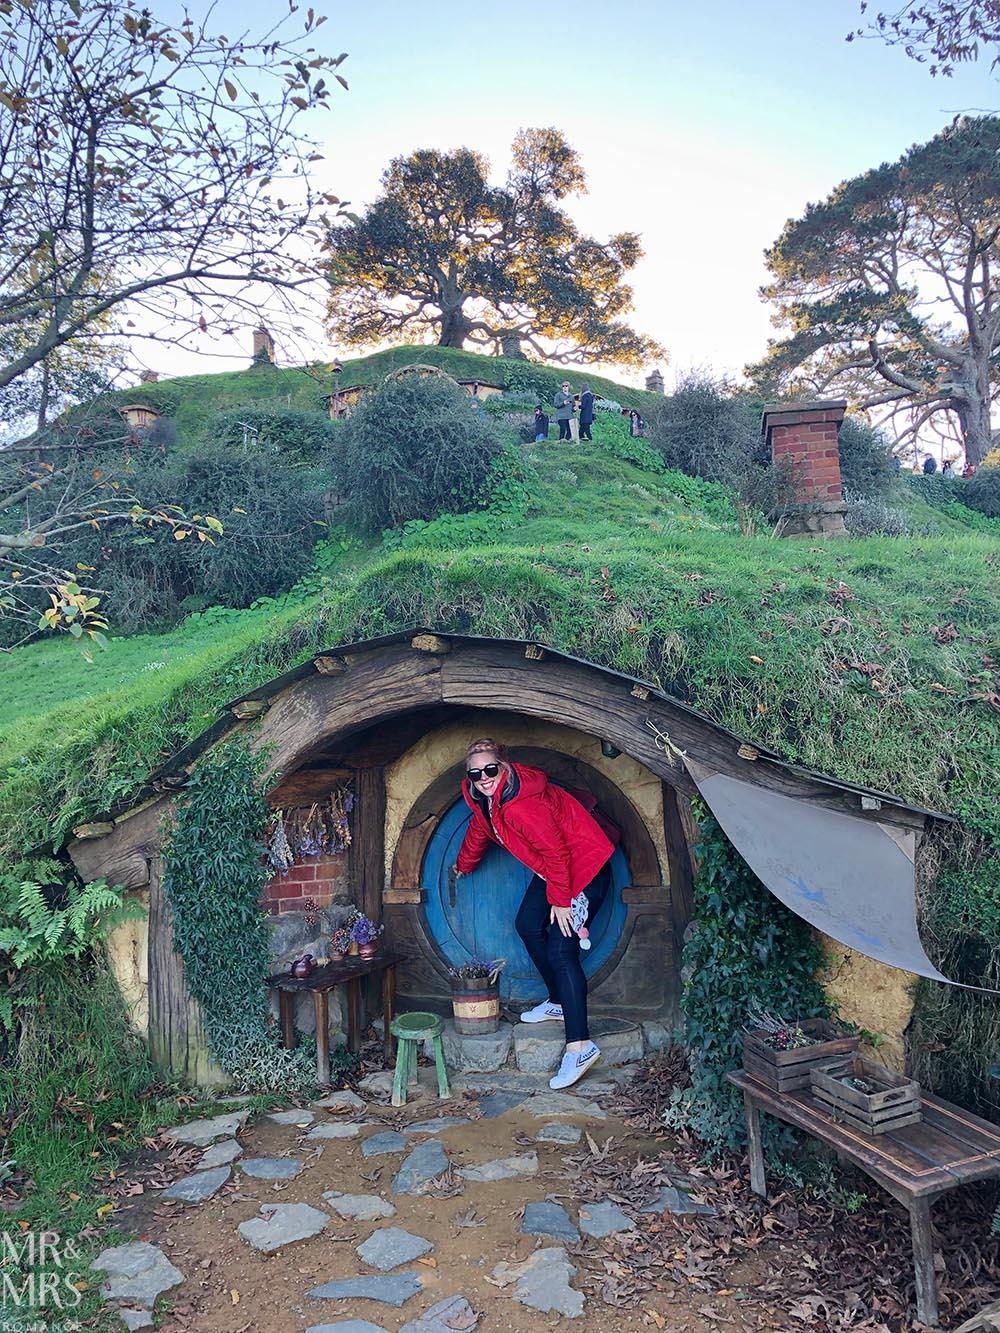 Hobbiton Movie Set, Waikato, New Zealand - hobbit hole